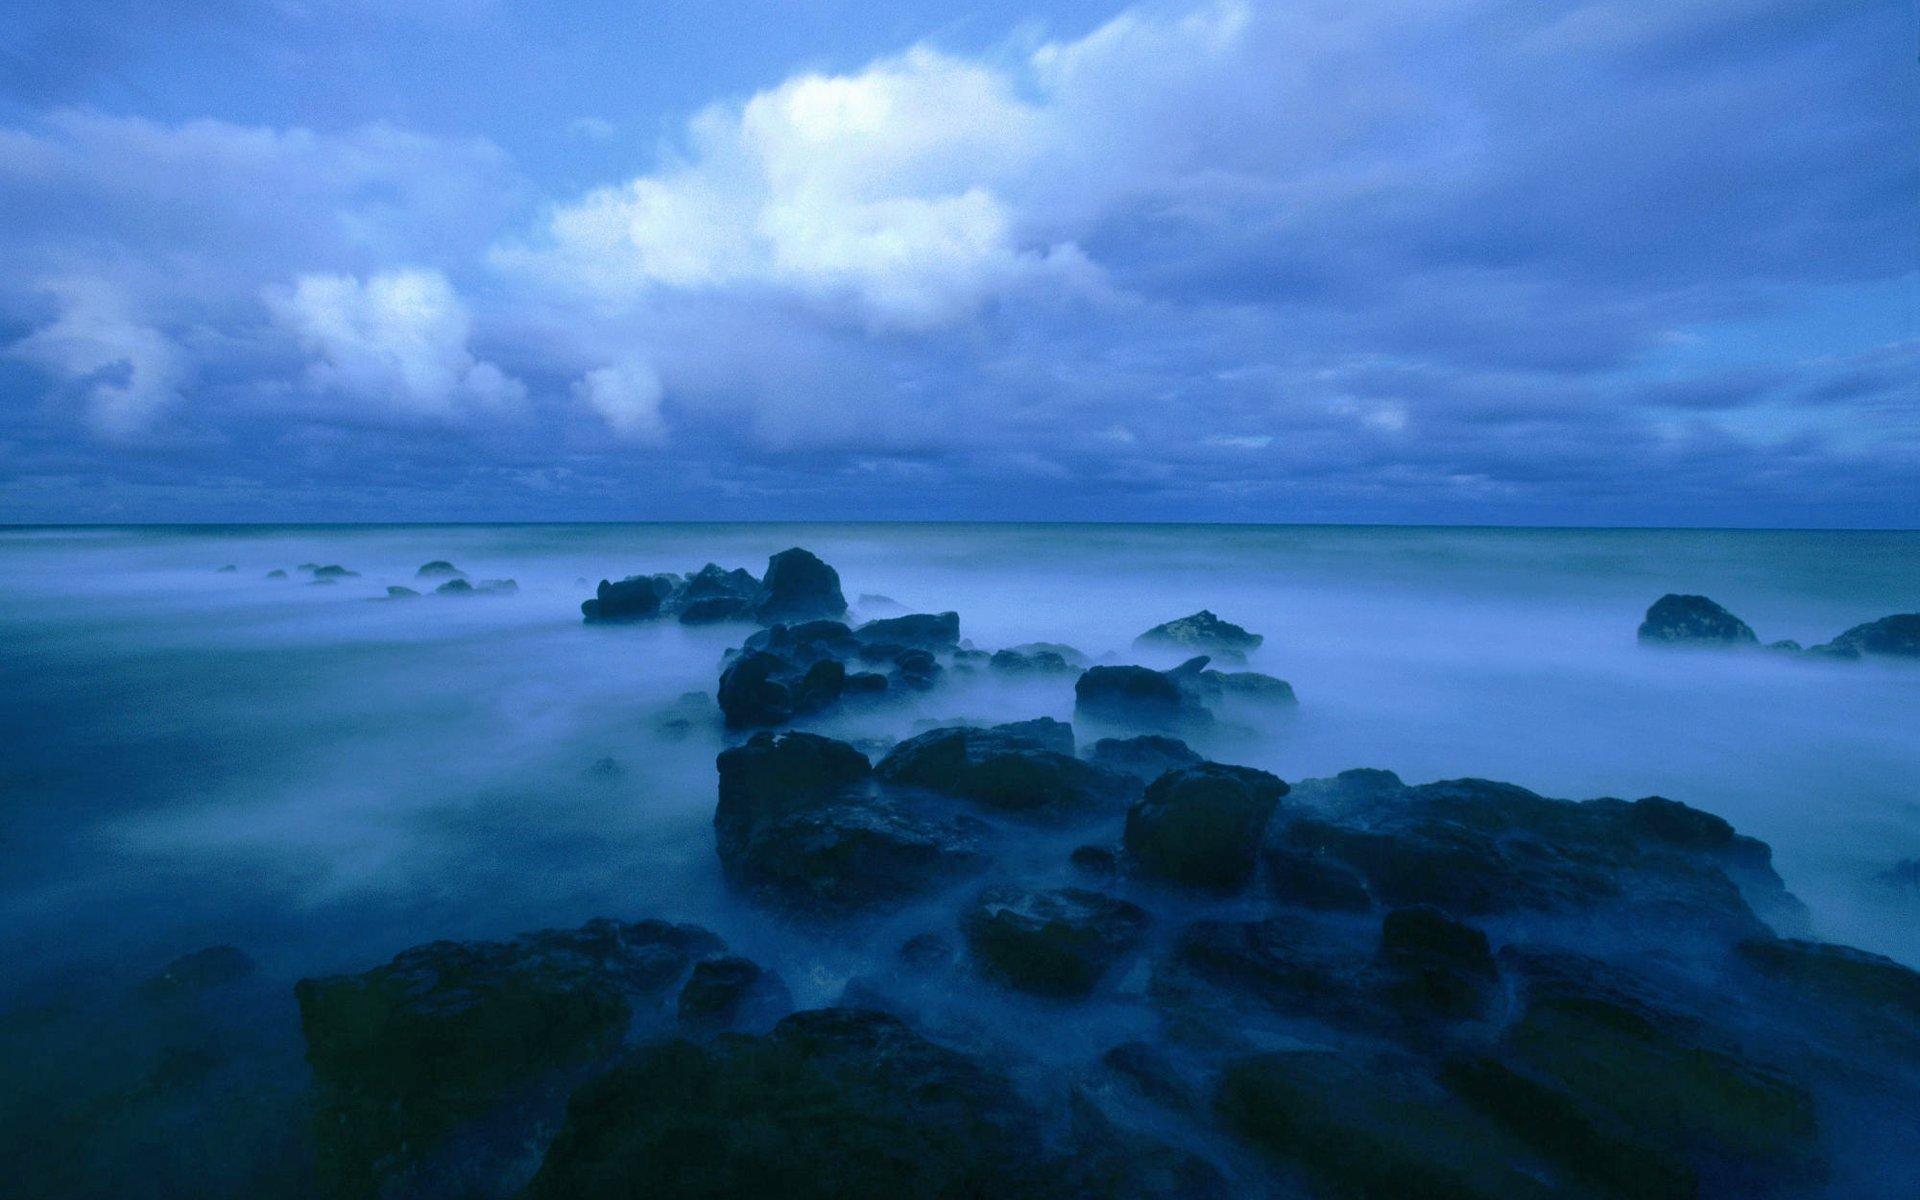 Wallpaper Of Blue Nature